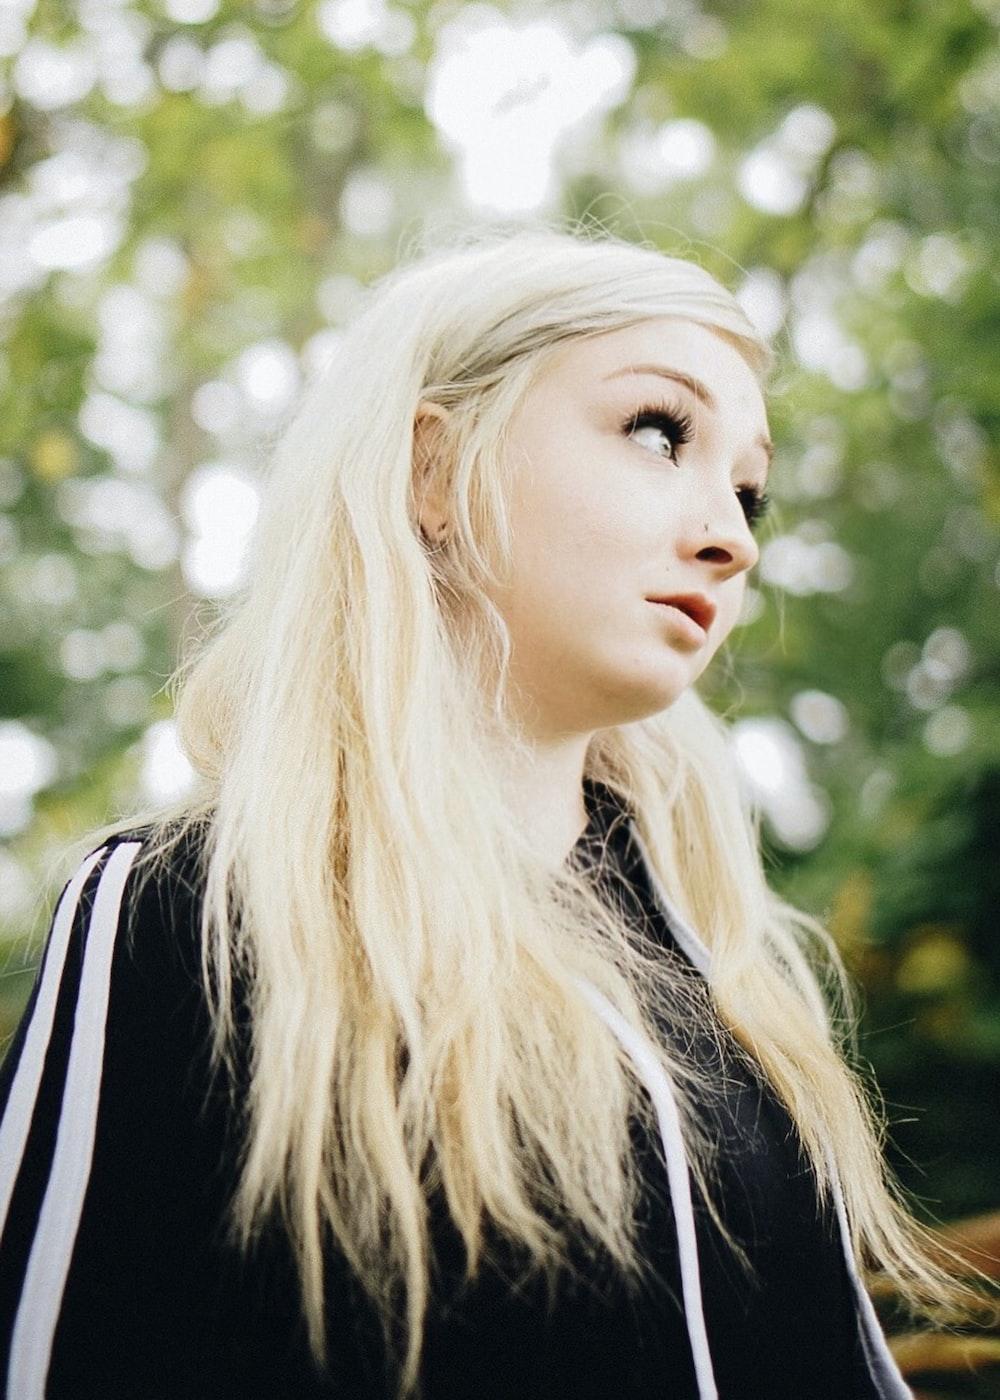 woman with blonde hair wearing black jacket